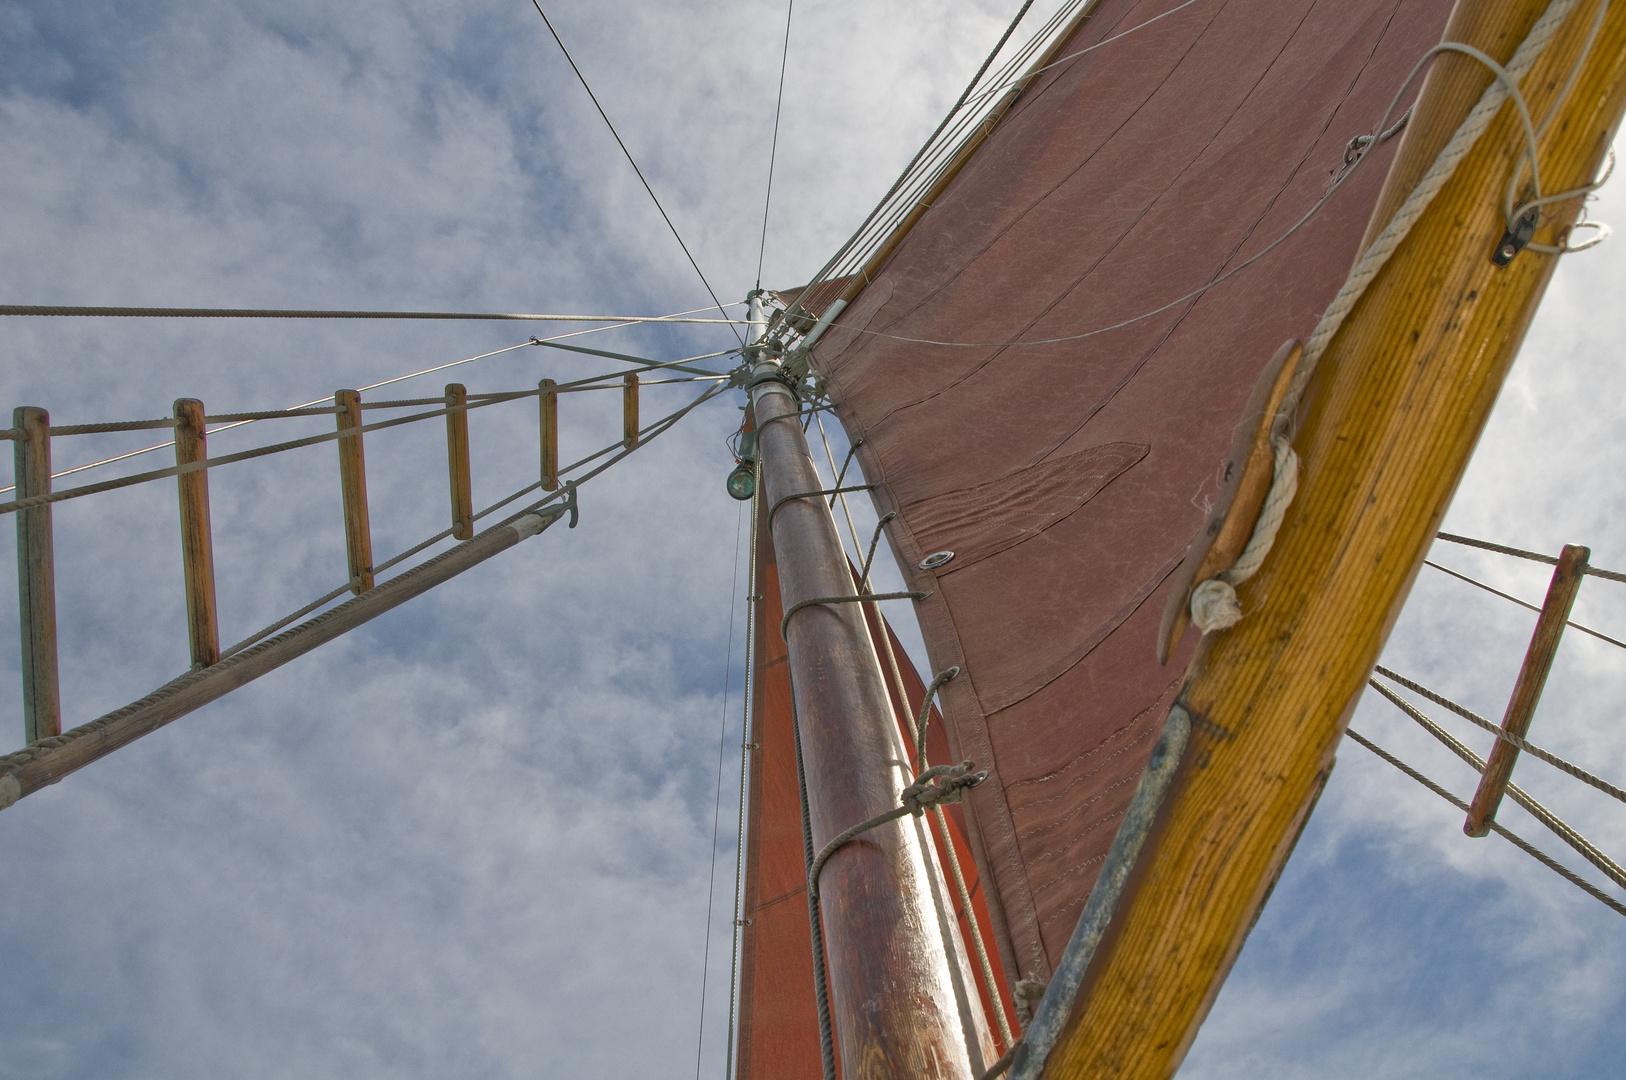 Akaroa - set sail 11